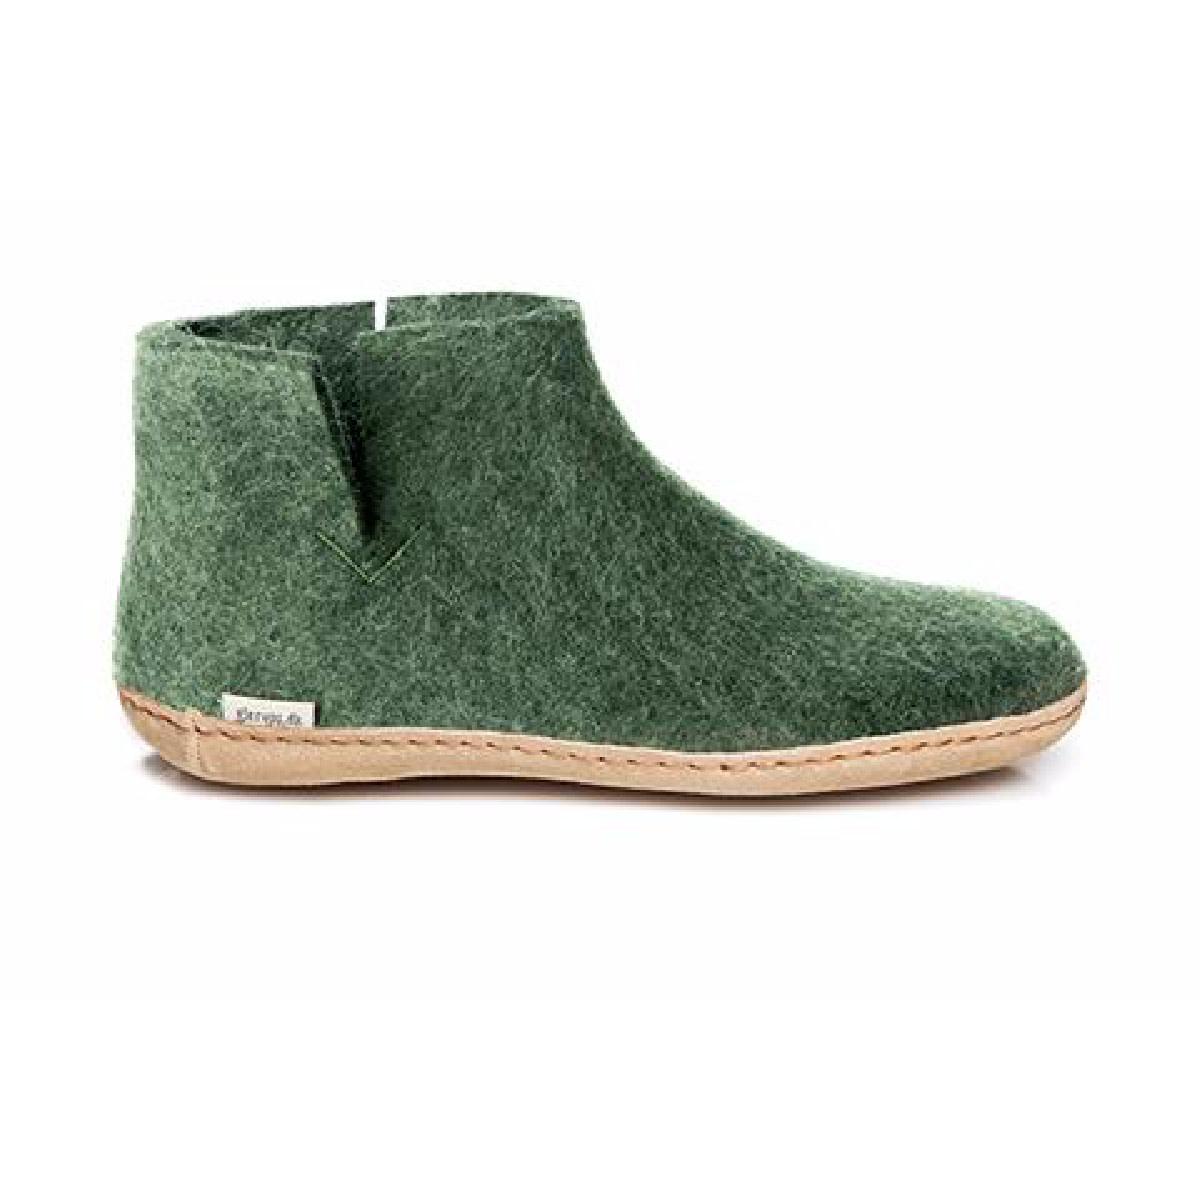 Glerups Glerups Women's  Boot Leather Sole Forest